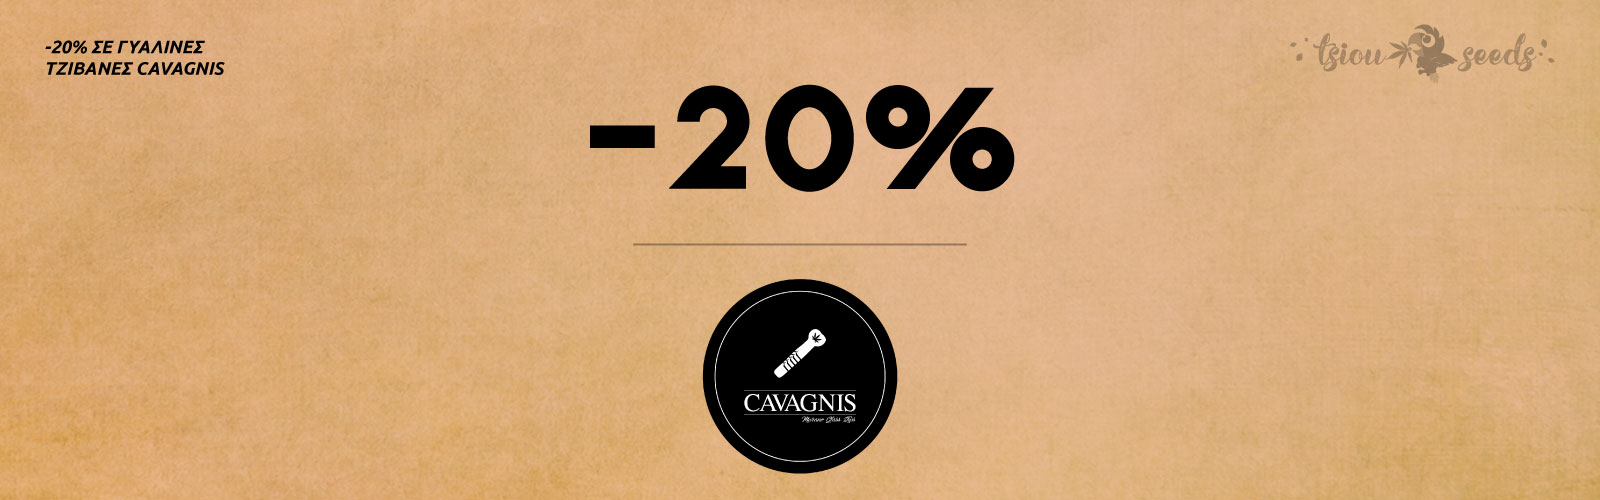 Cavagnis-Offer-20